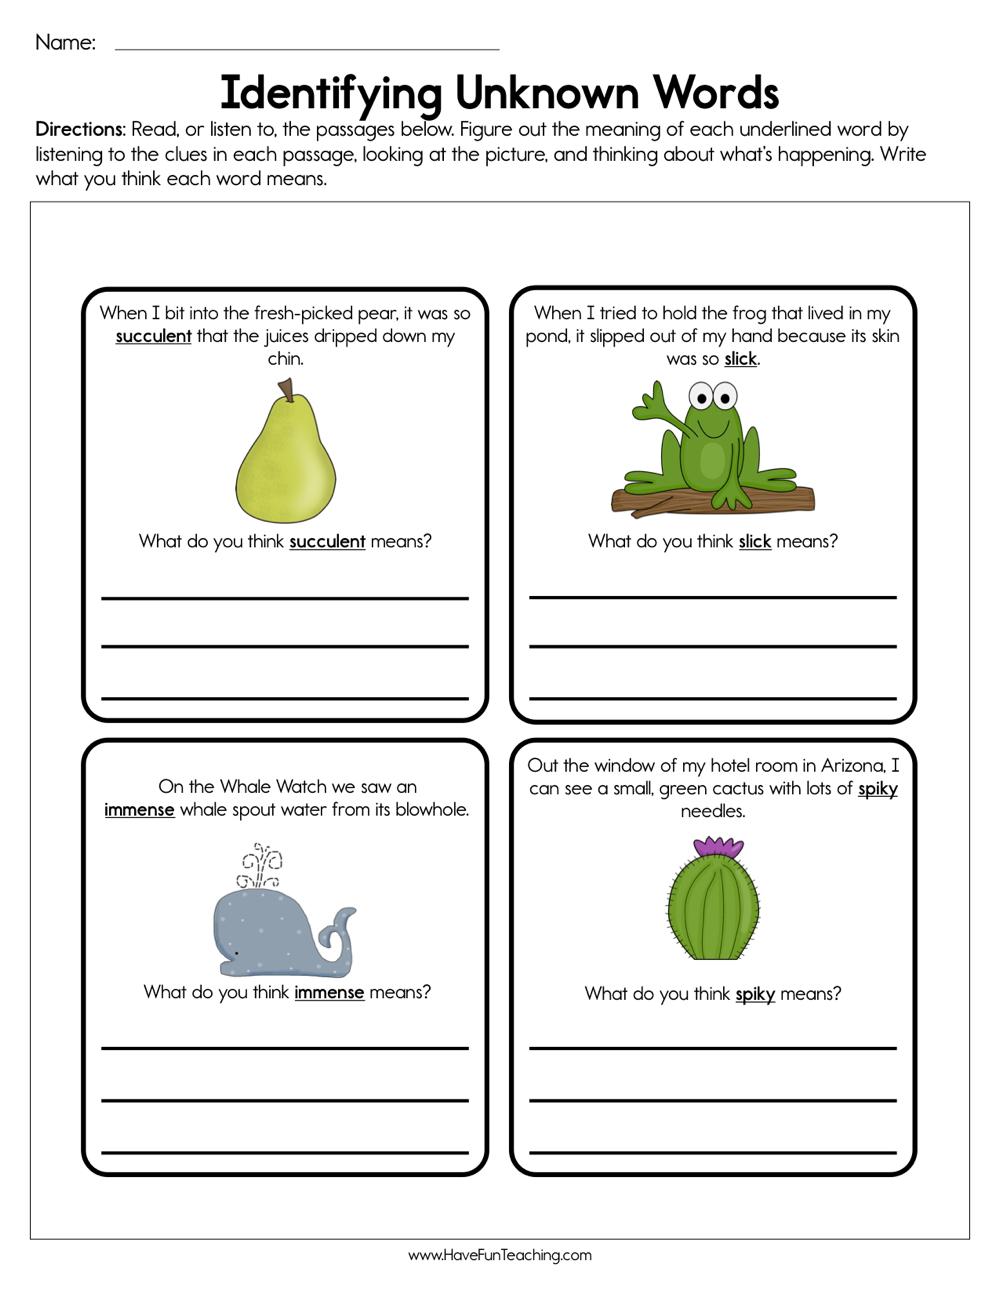 Identifying Unknown Words Worksheet